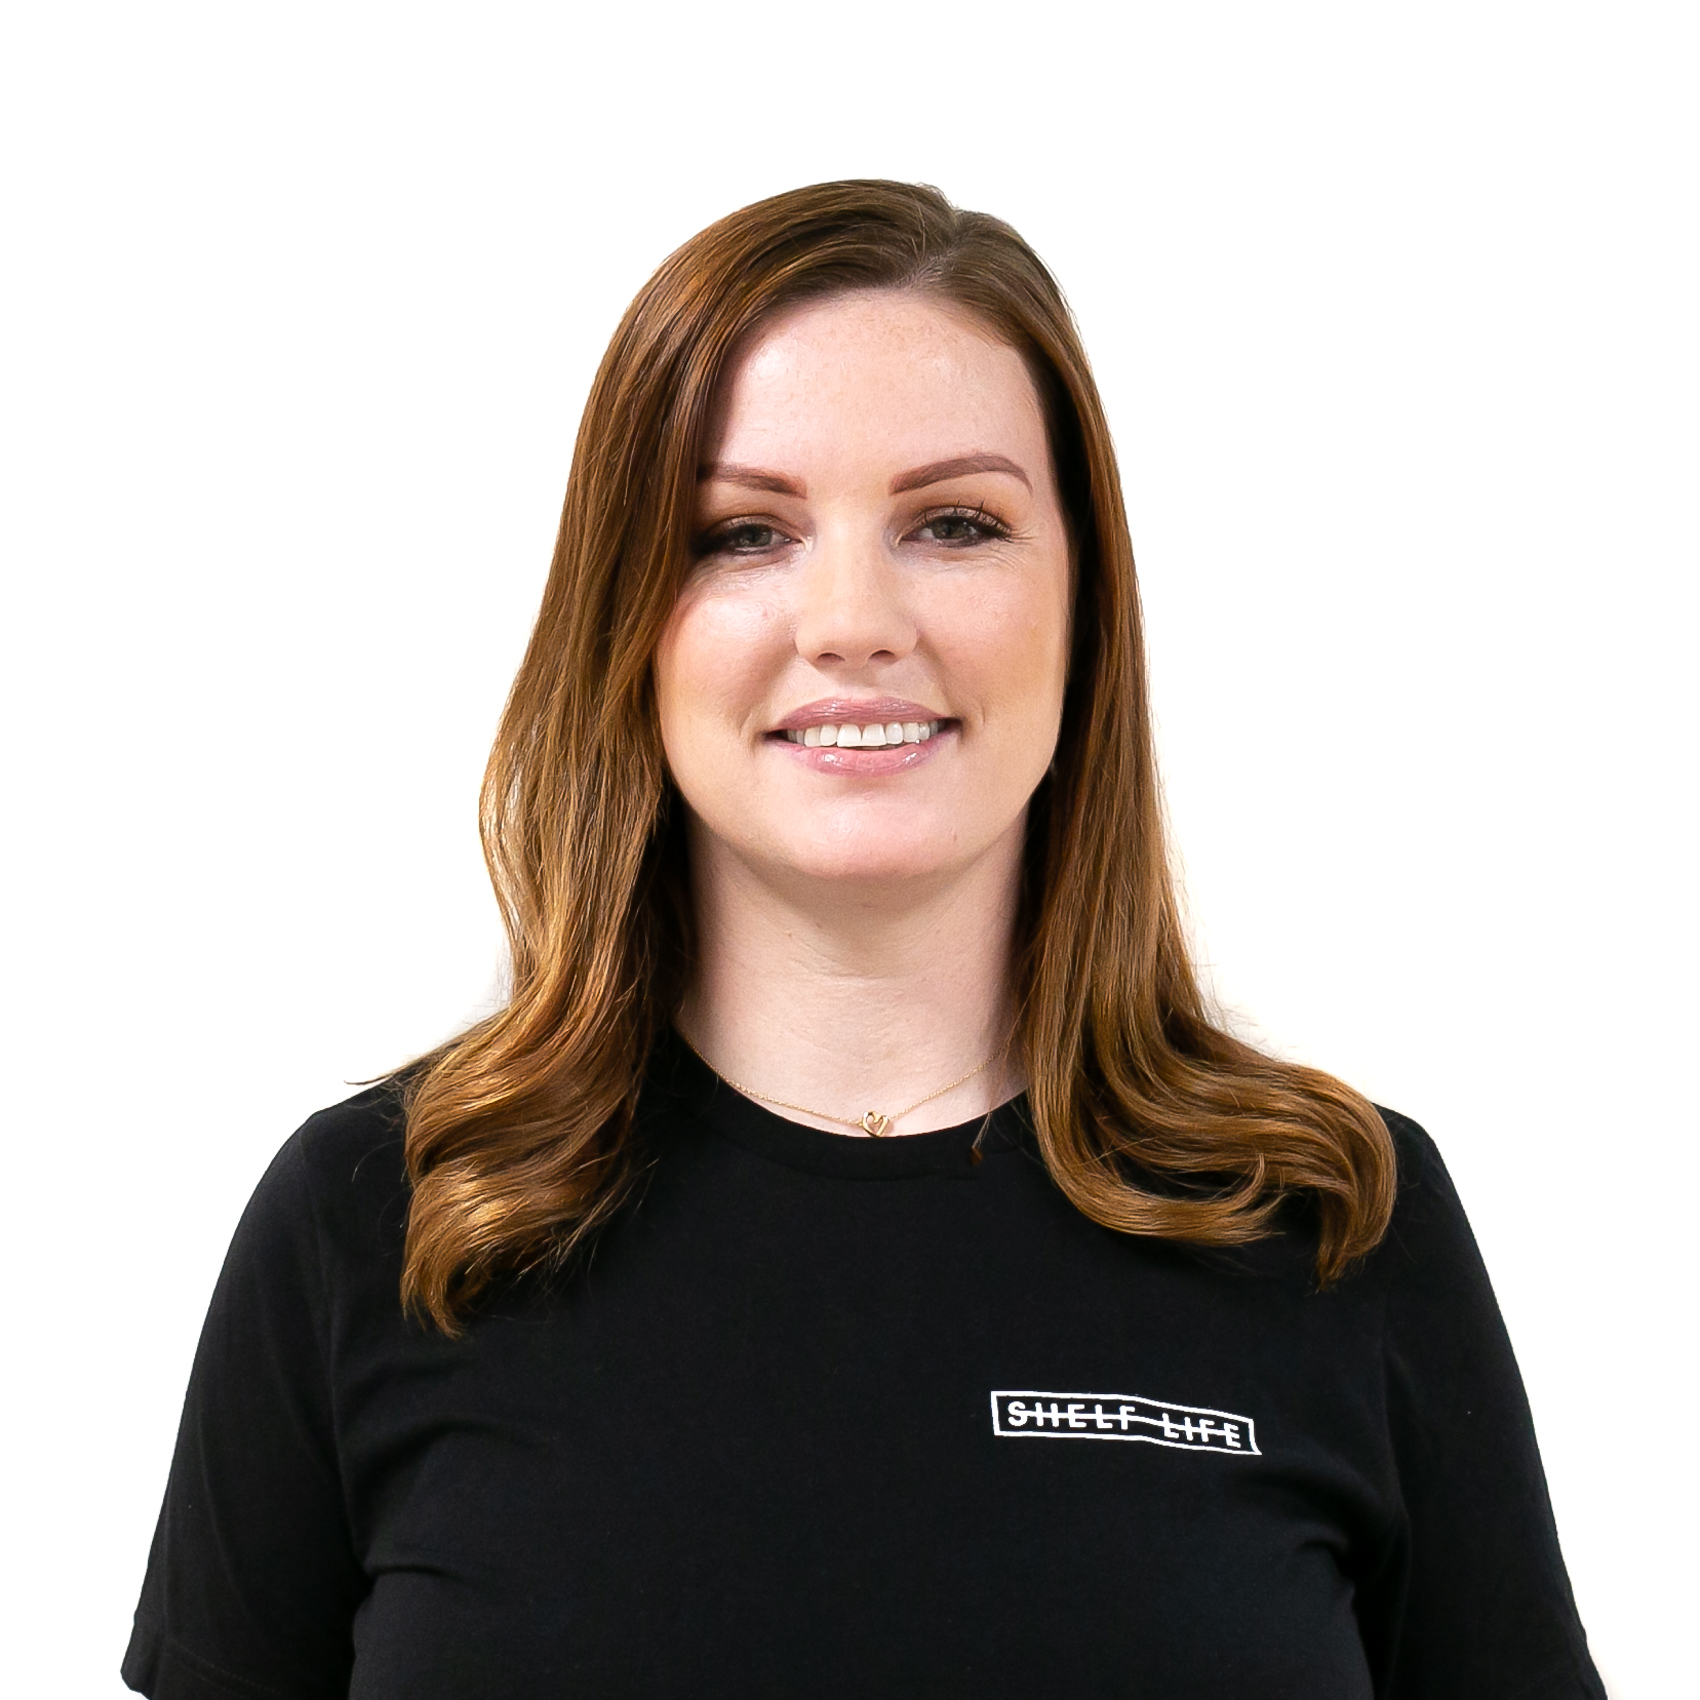 Crystal Beza - Office Support Coordinator